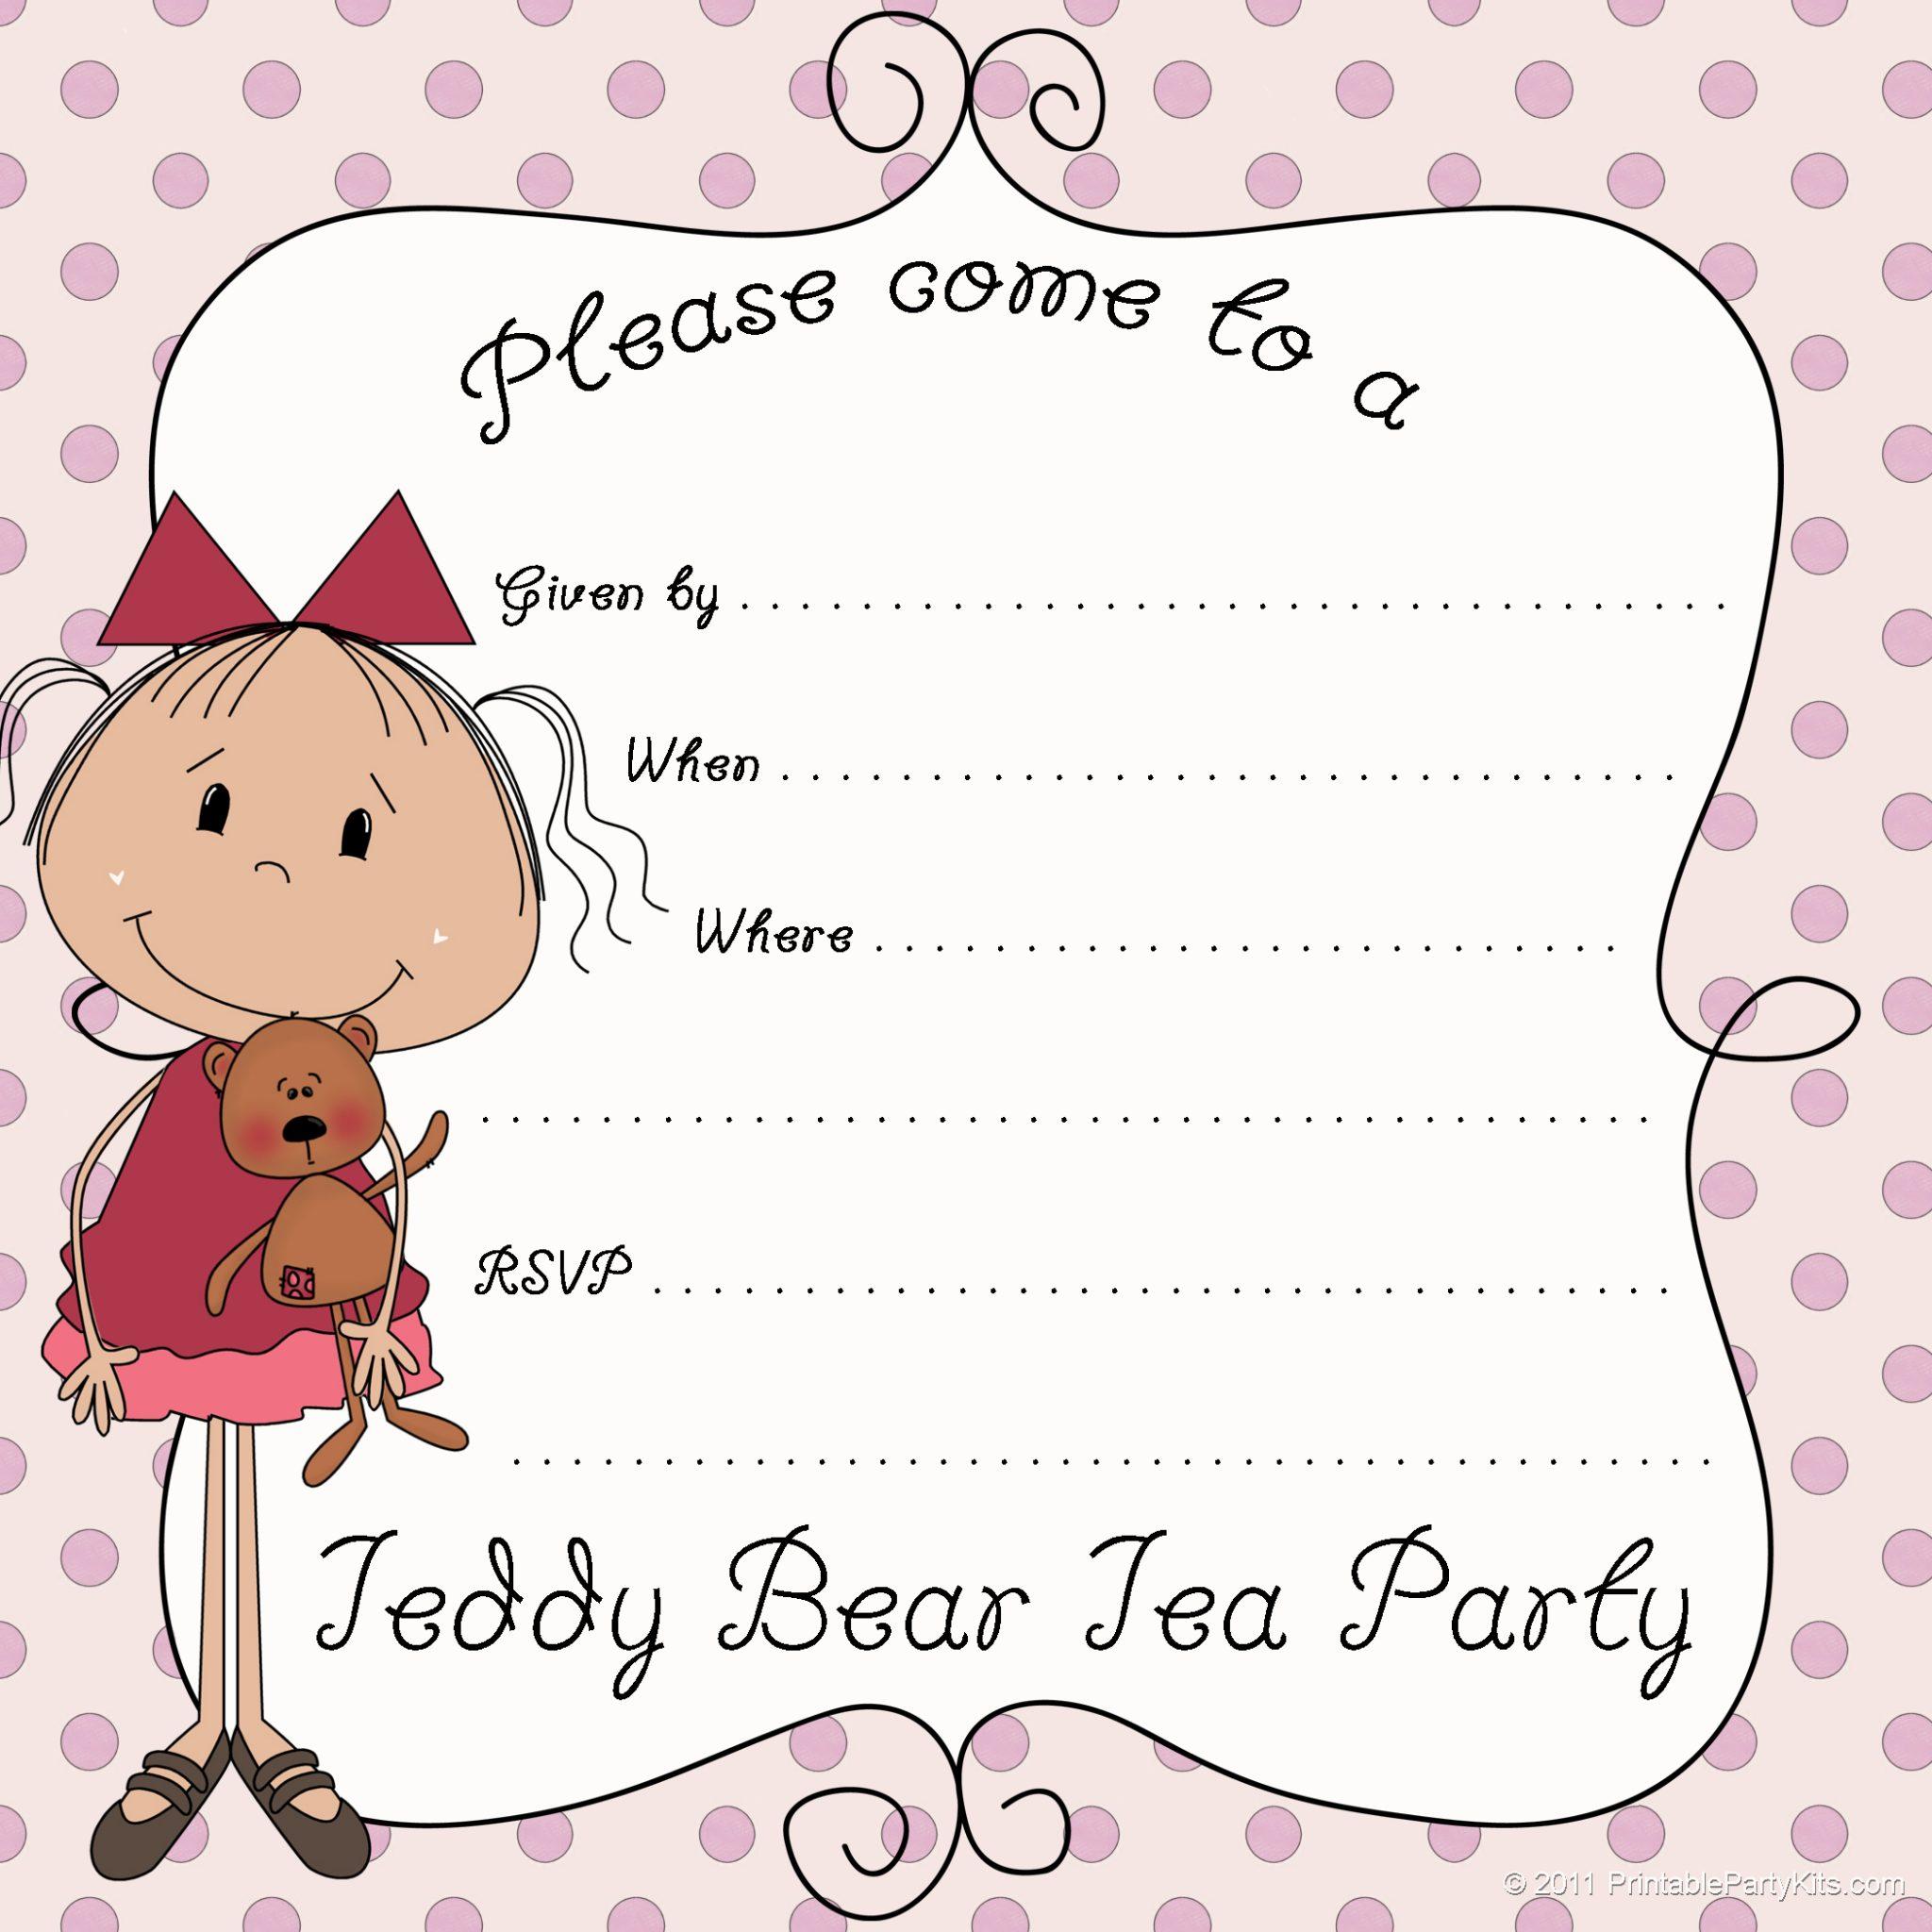 Free Printable Teddy Bear Tea Party Invitations - Printable Party Kits